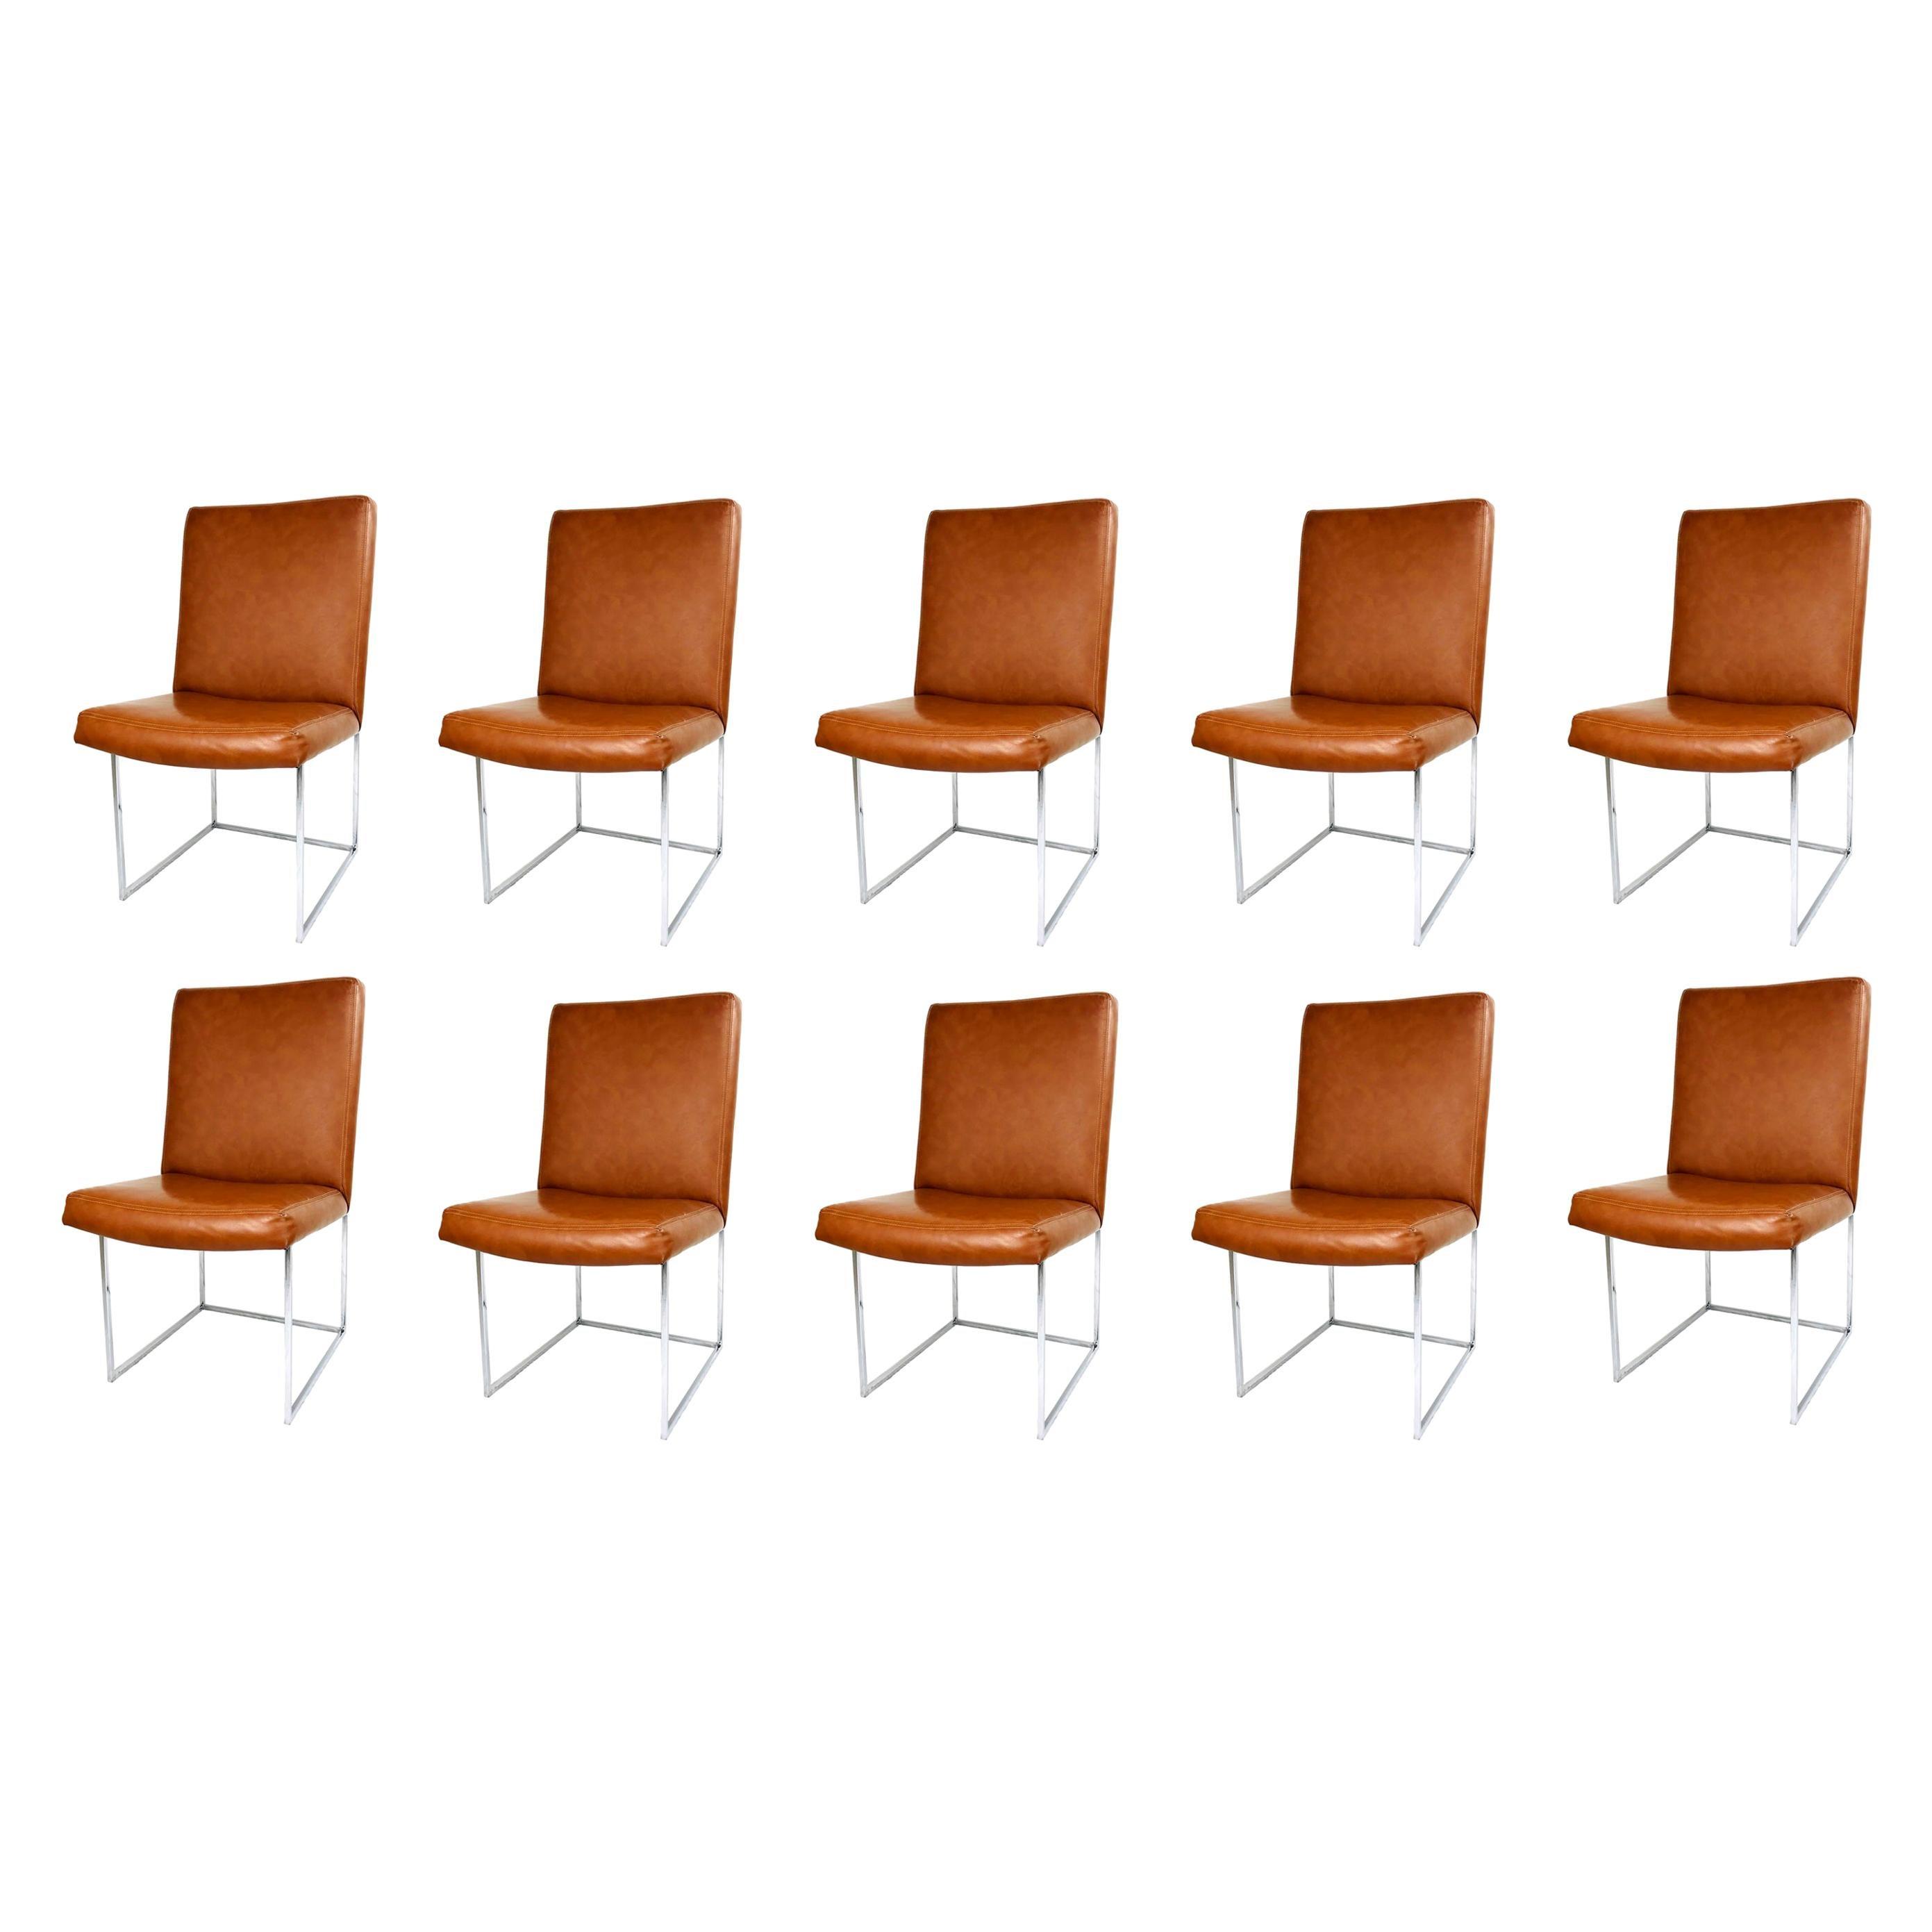 Set of 10 Milo Baughman Dining Chairs